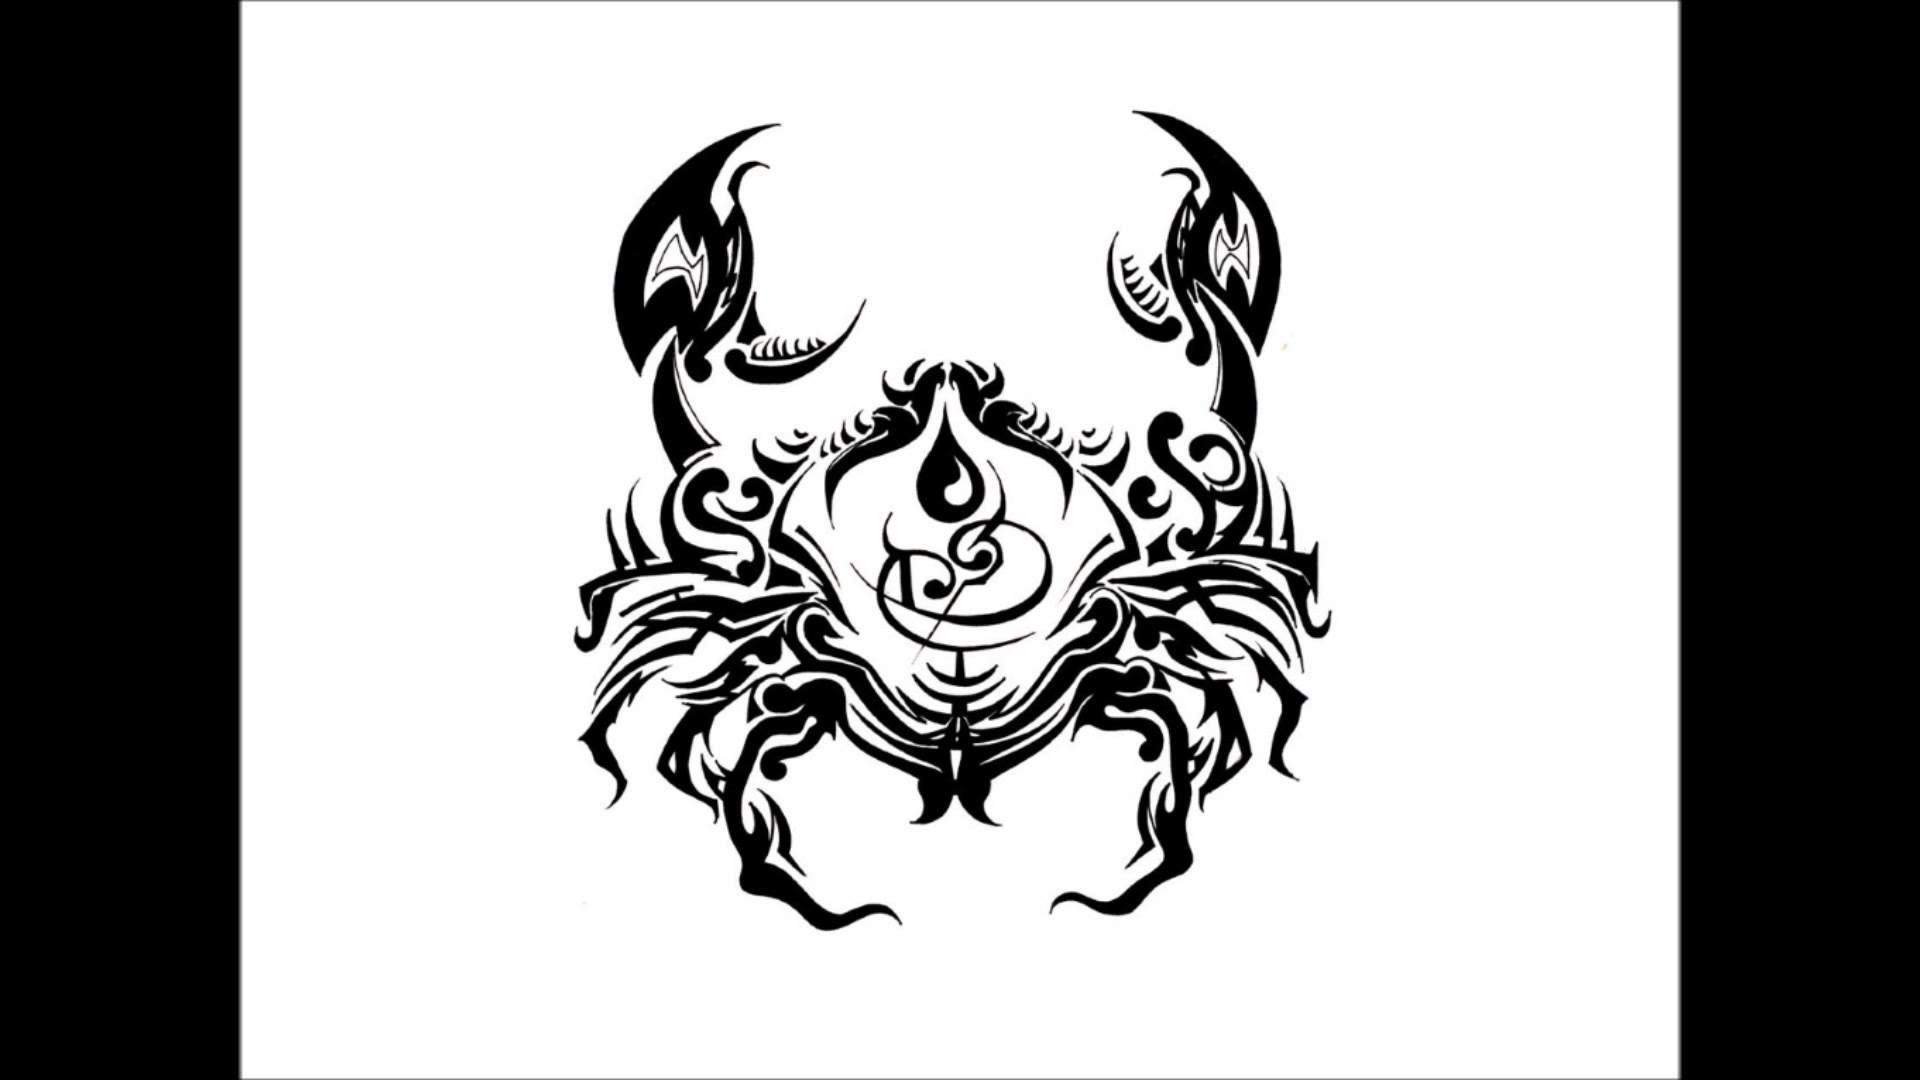 875222 zodiac cancer wallpaper 1920x1080 for retina